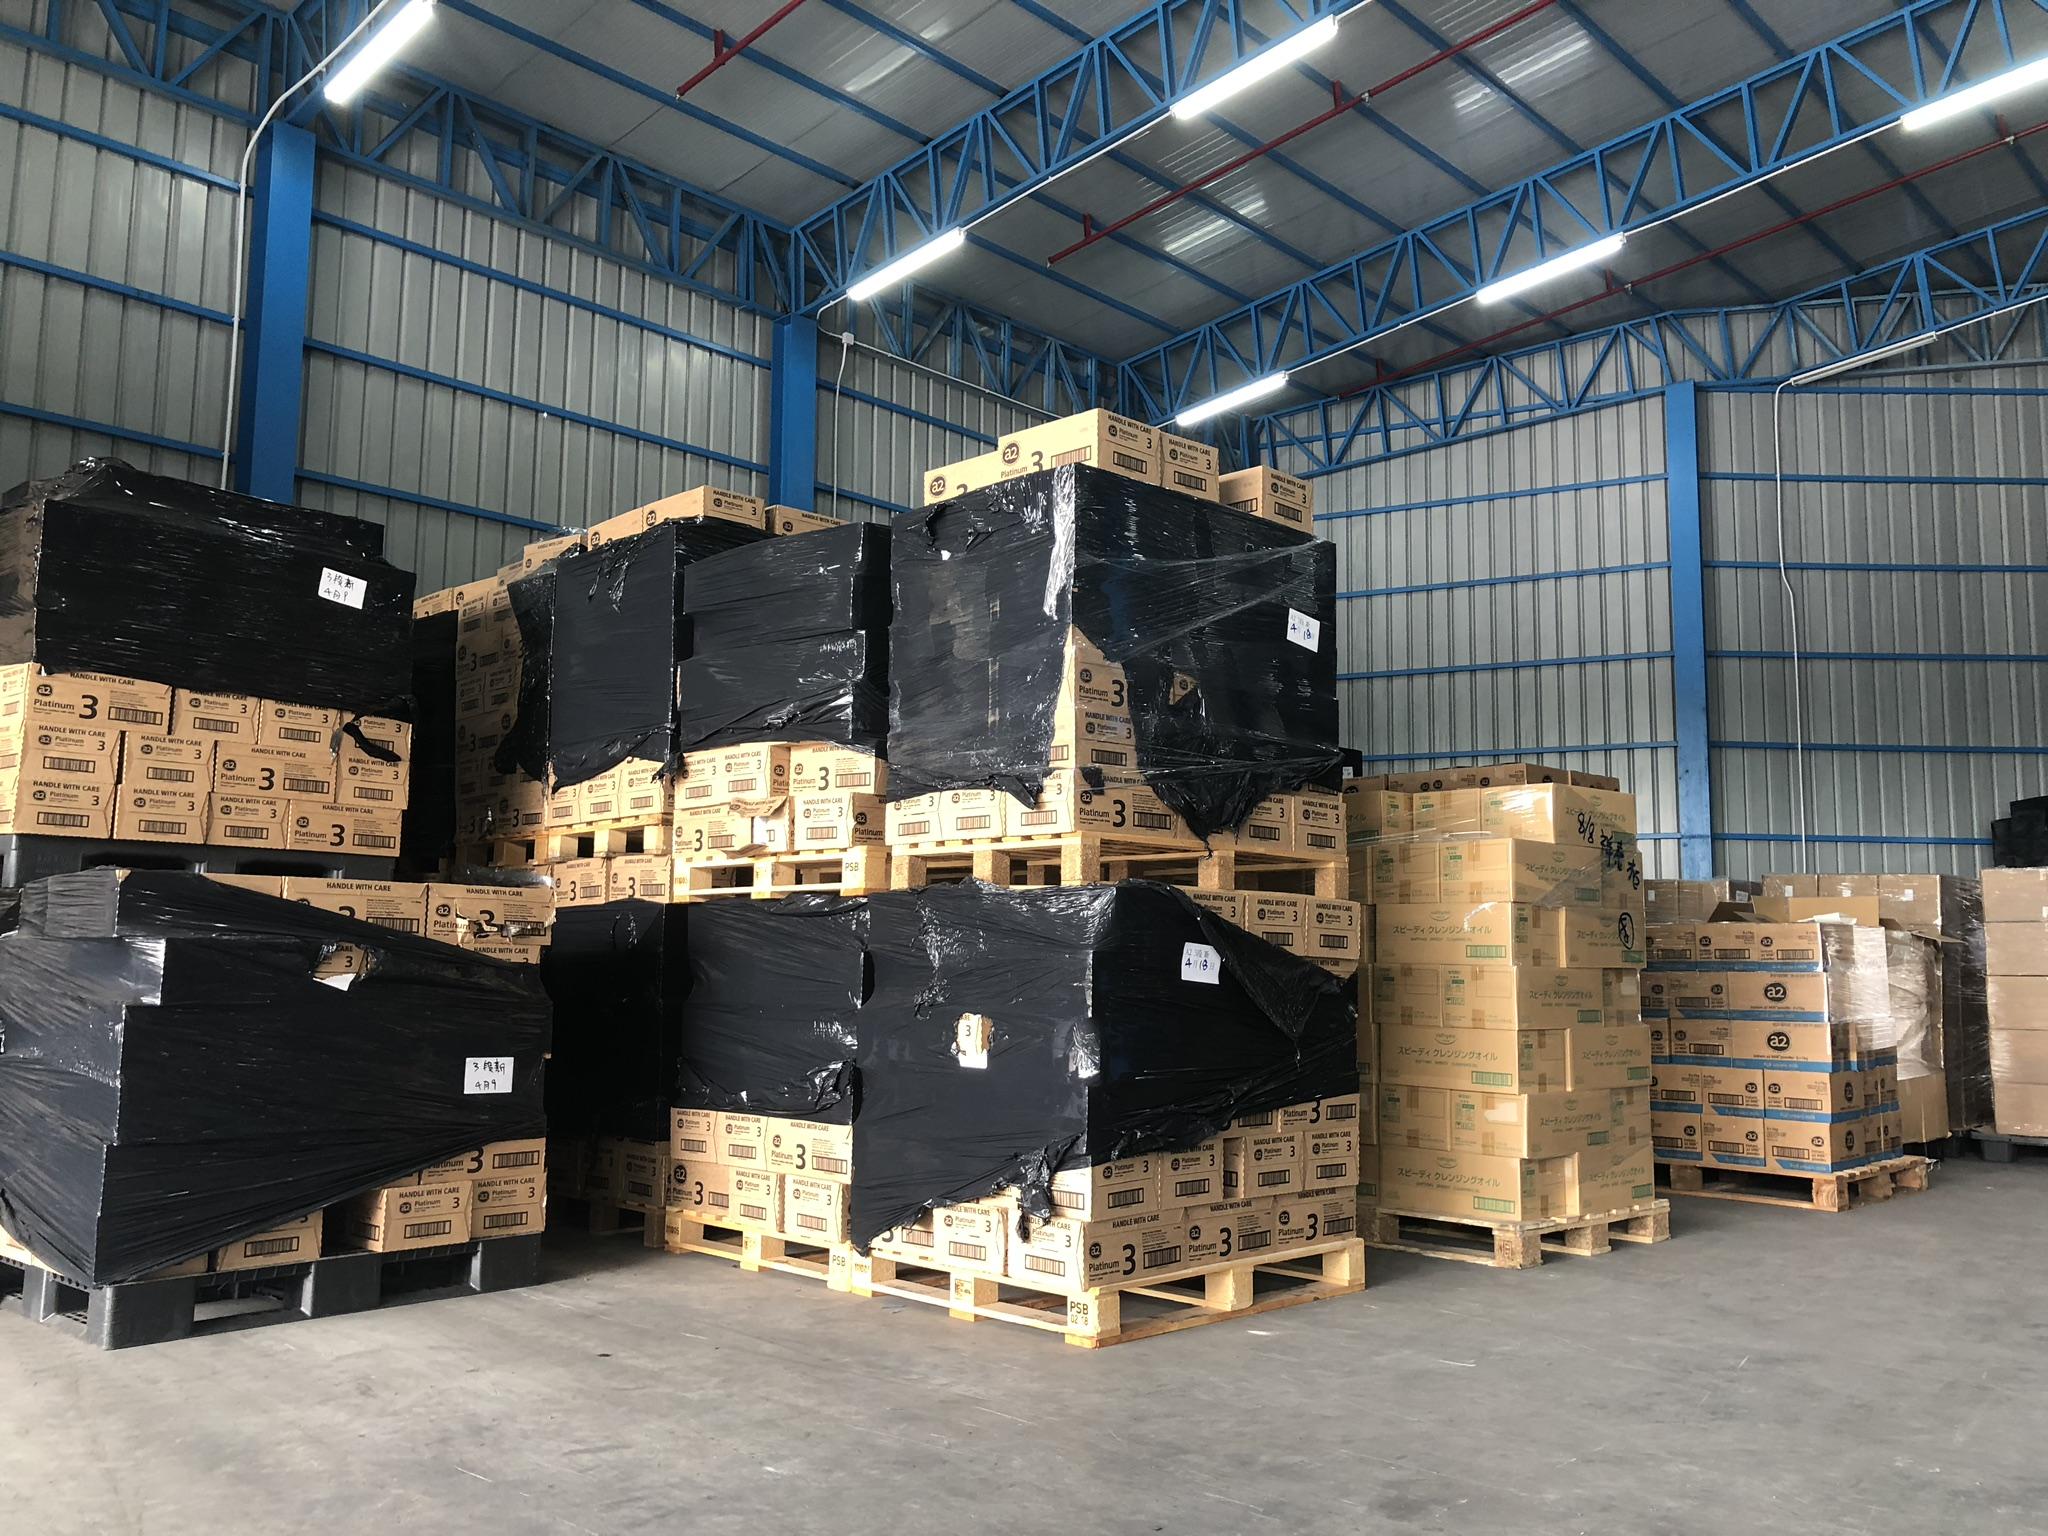 PU皮革香港一般贸易进口到深圳流程 一般贸易报关需要多久